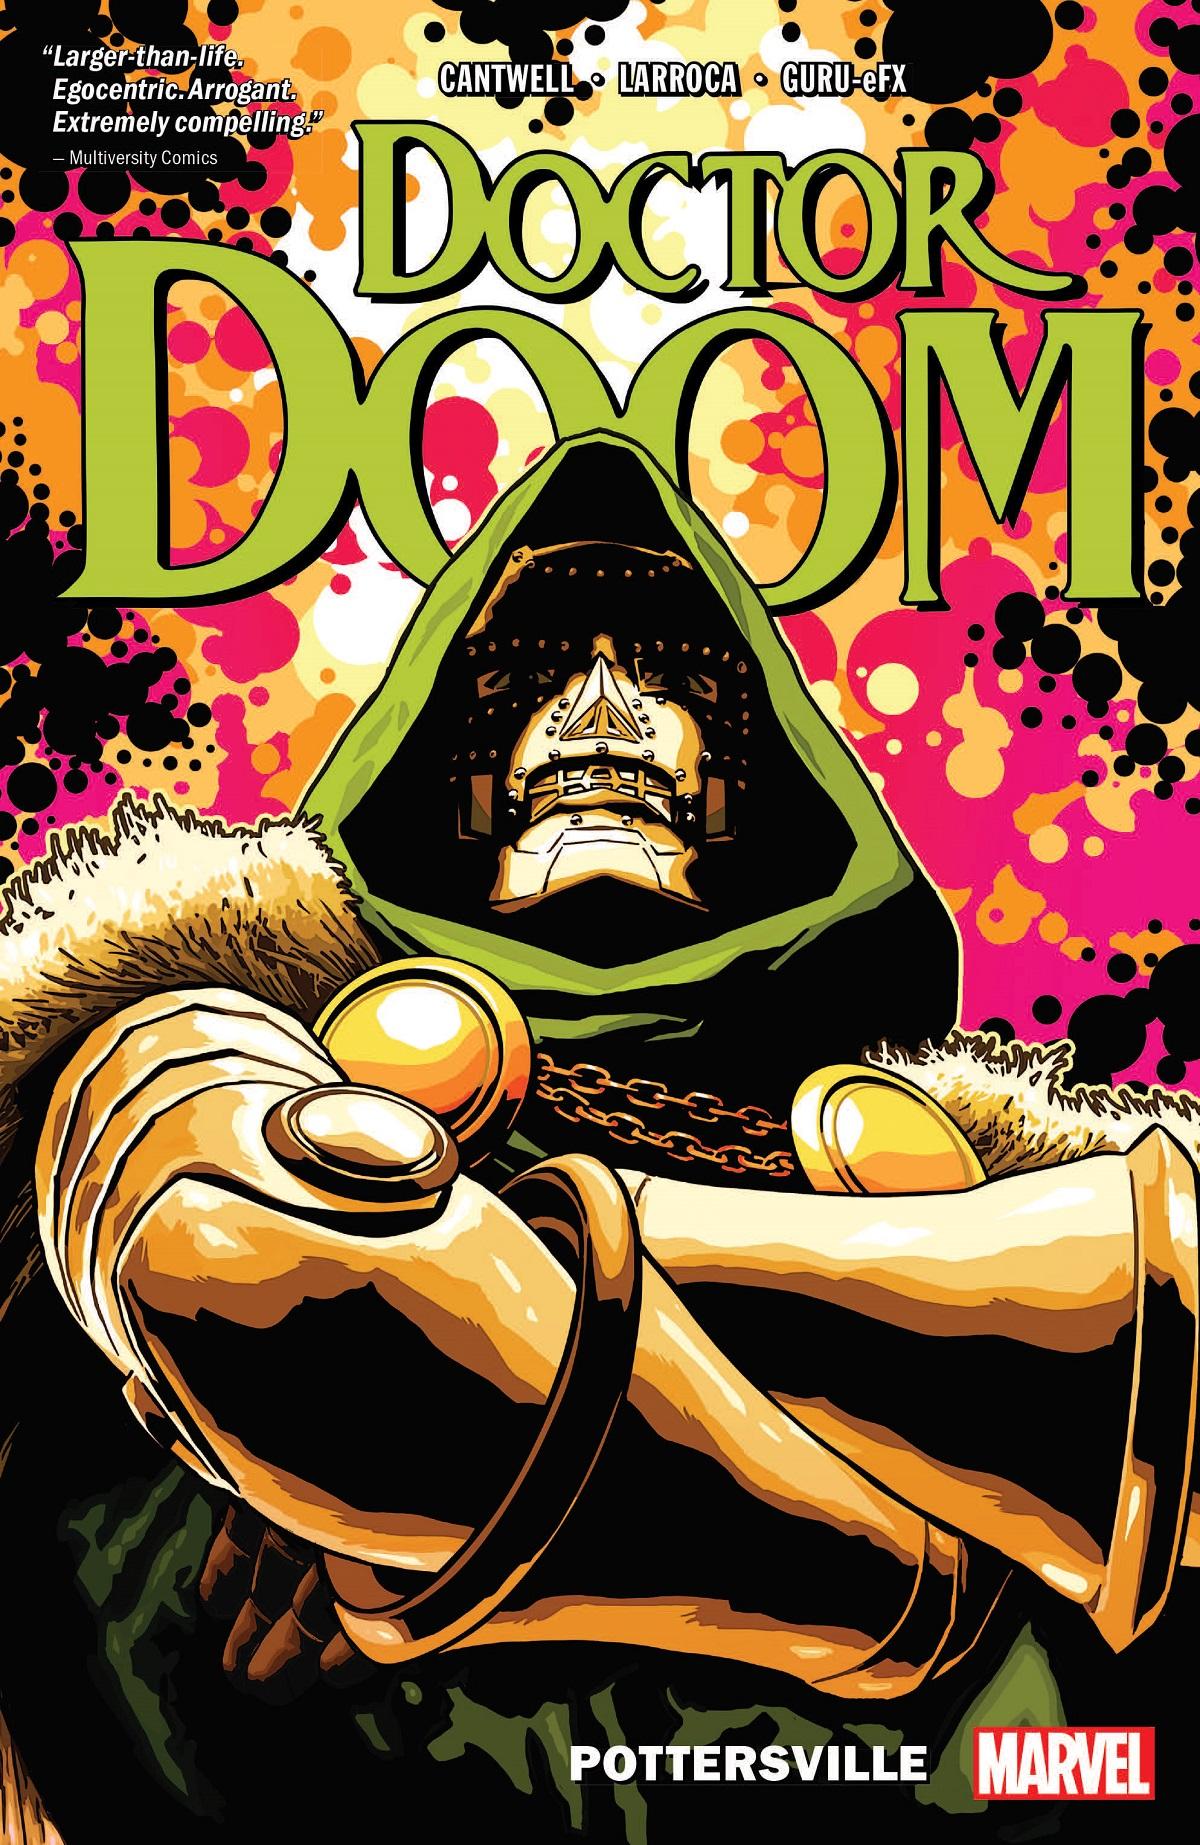 Doctor Doom Vol. 1: Pottersville (Trade Paperback)